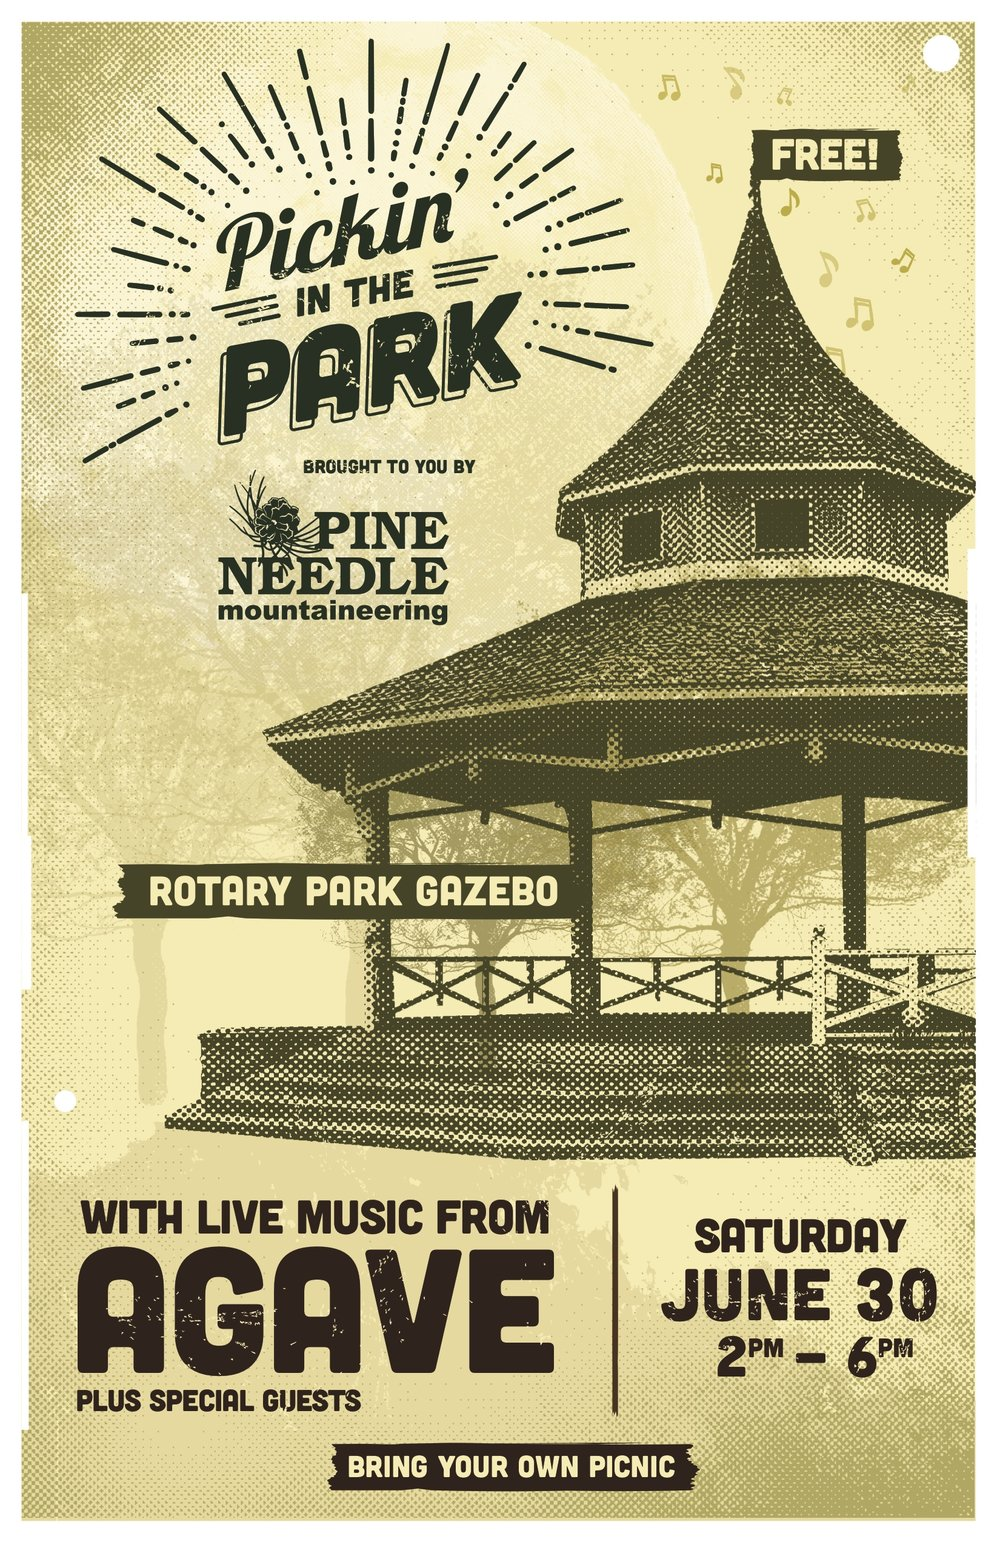 Pine_Needle_Mountaineering+Pickin_Poster_11x17-1.jpg